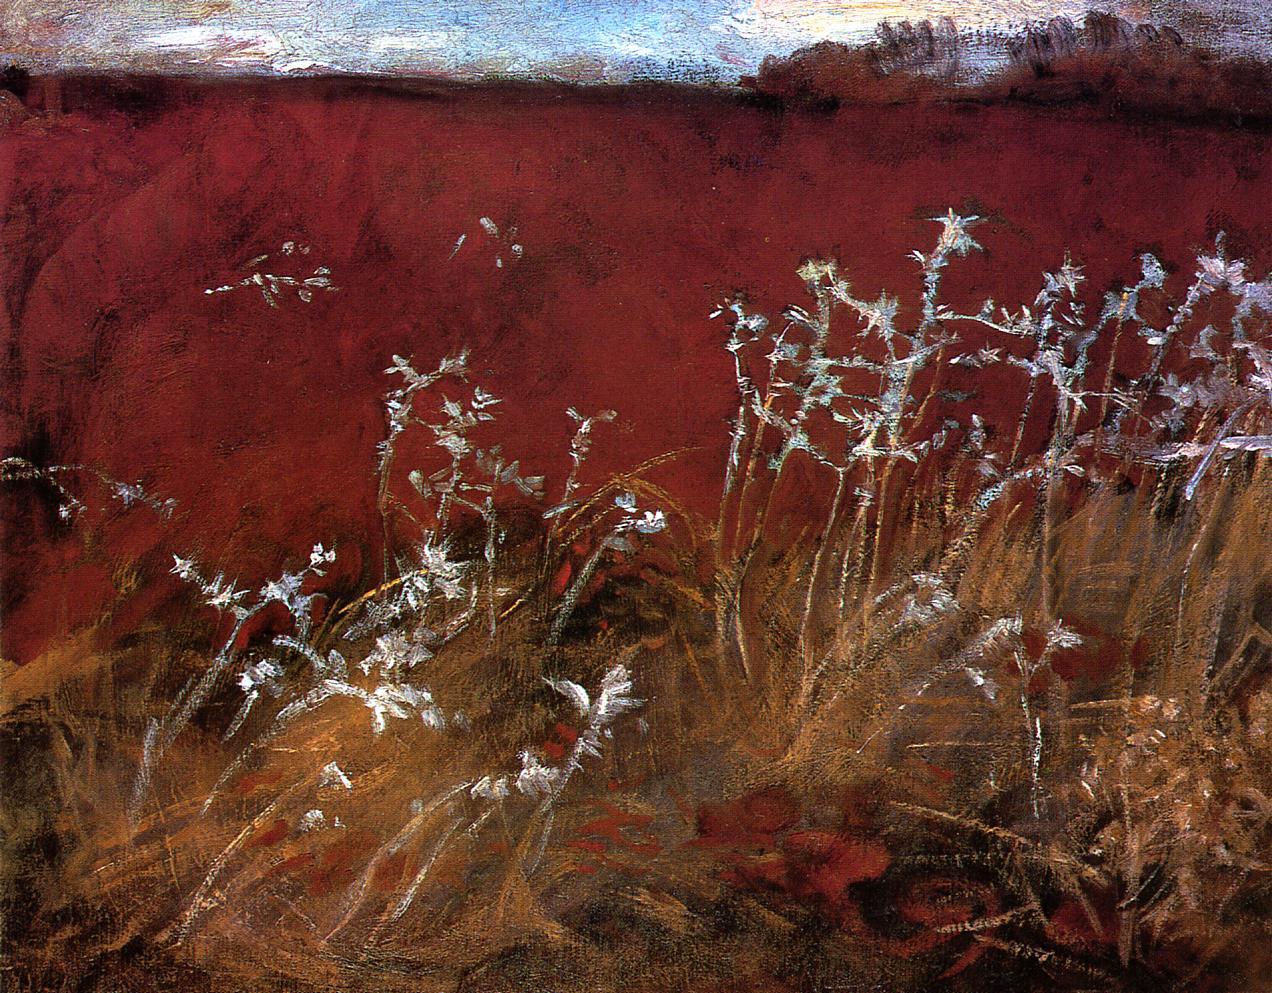 Thistles 1883-1884 | John Singer Sargent | Oil Painting